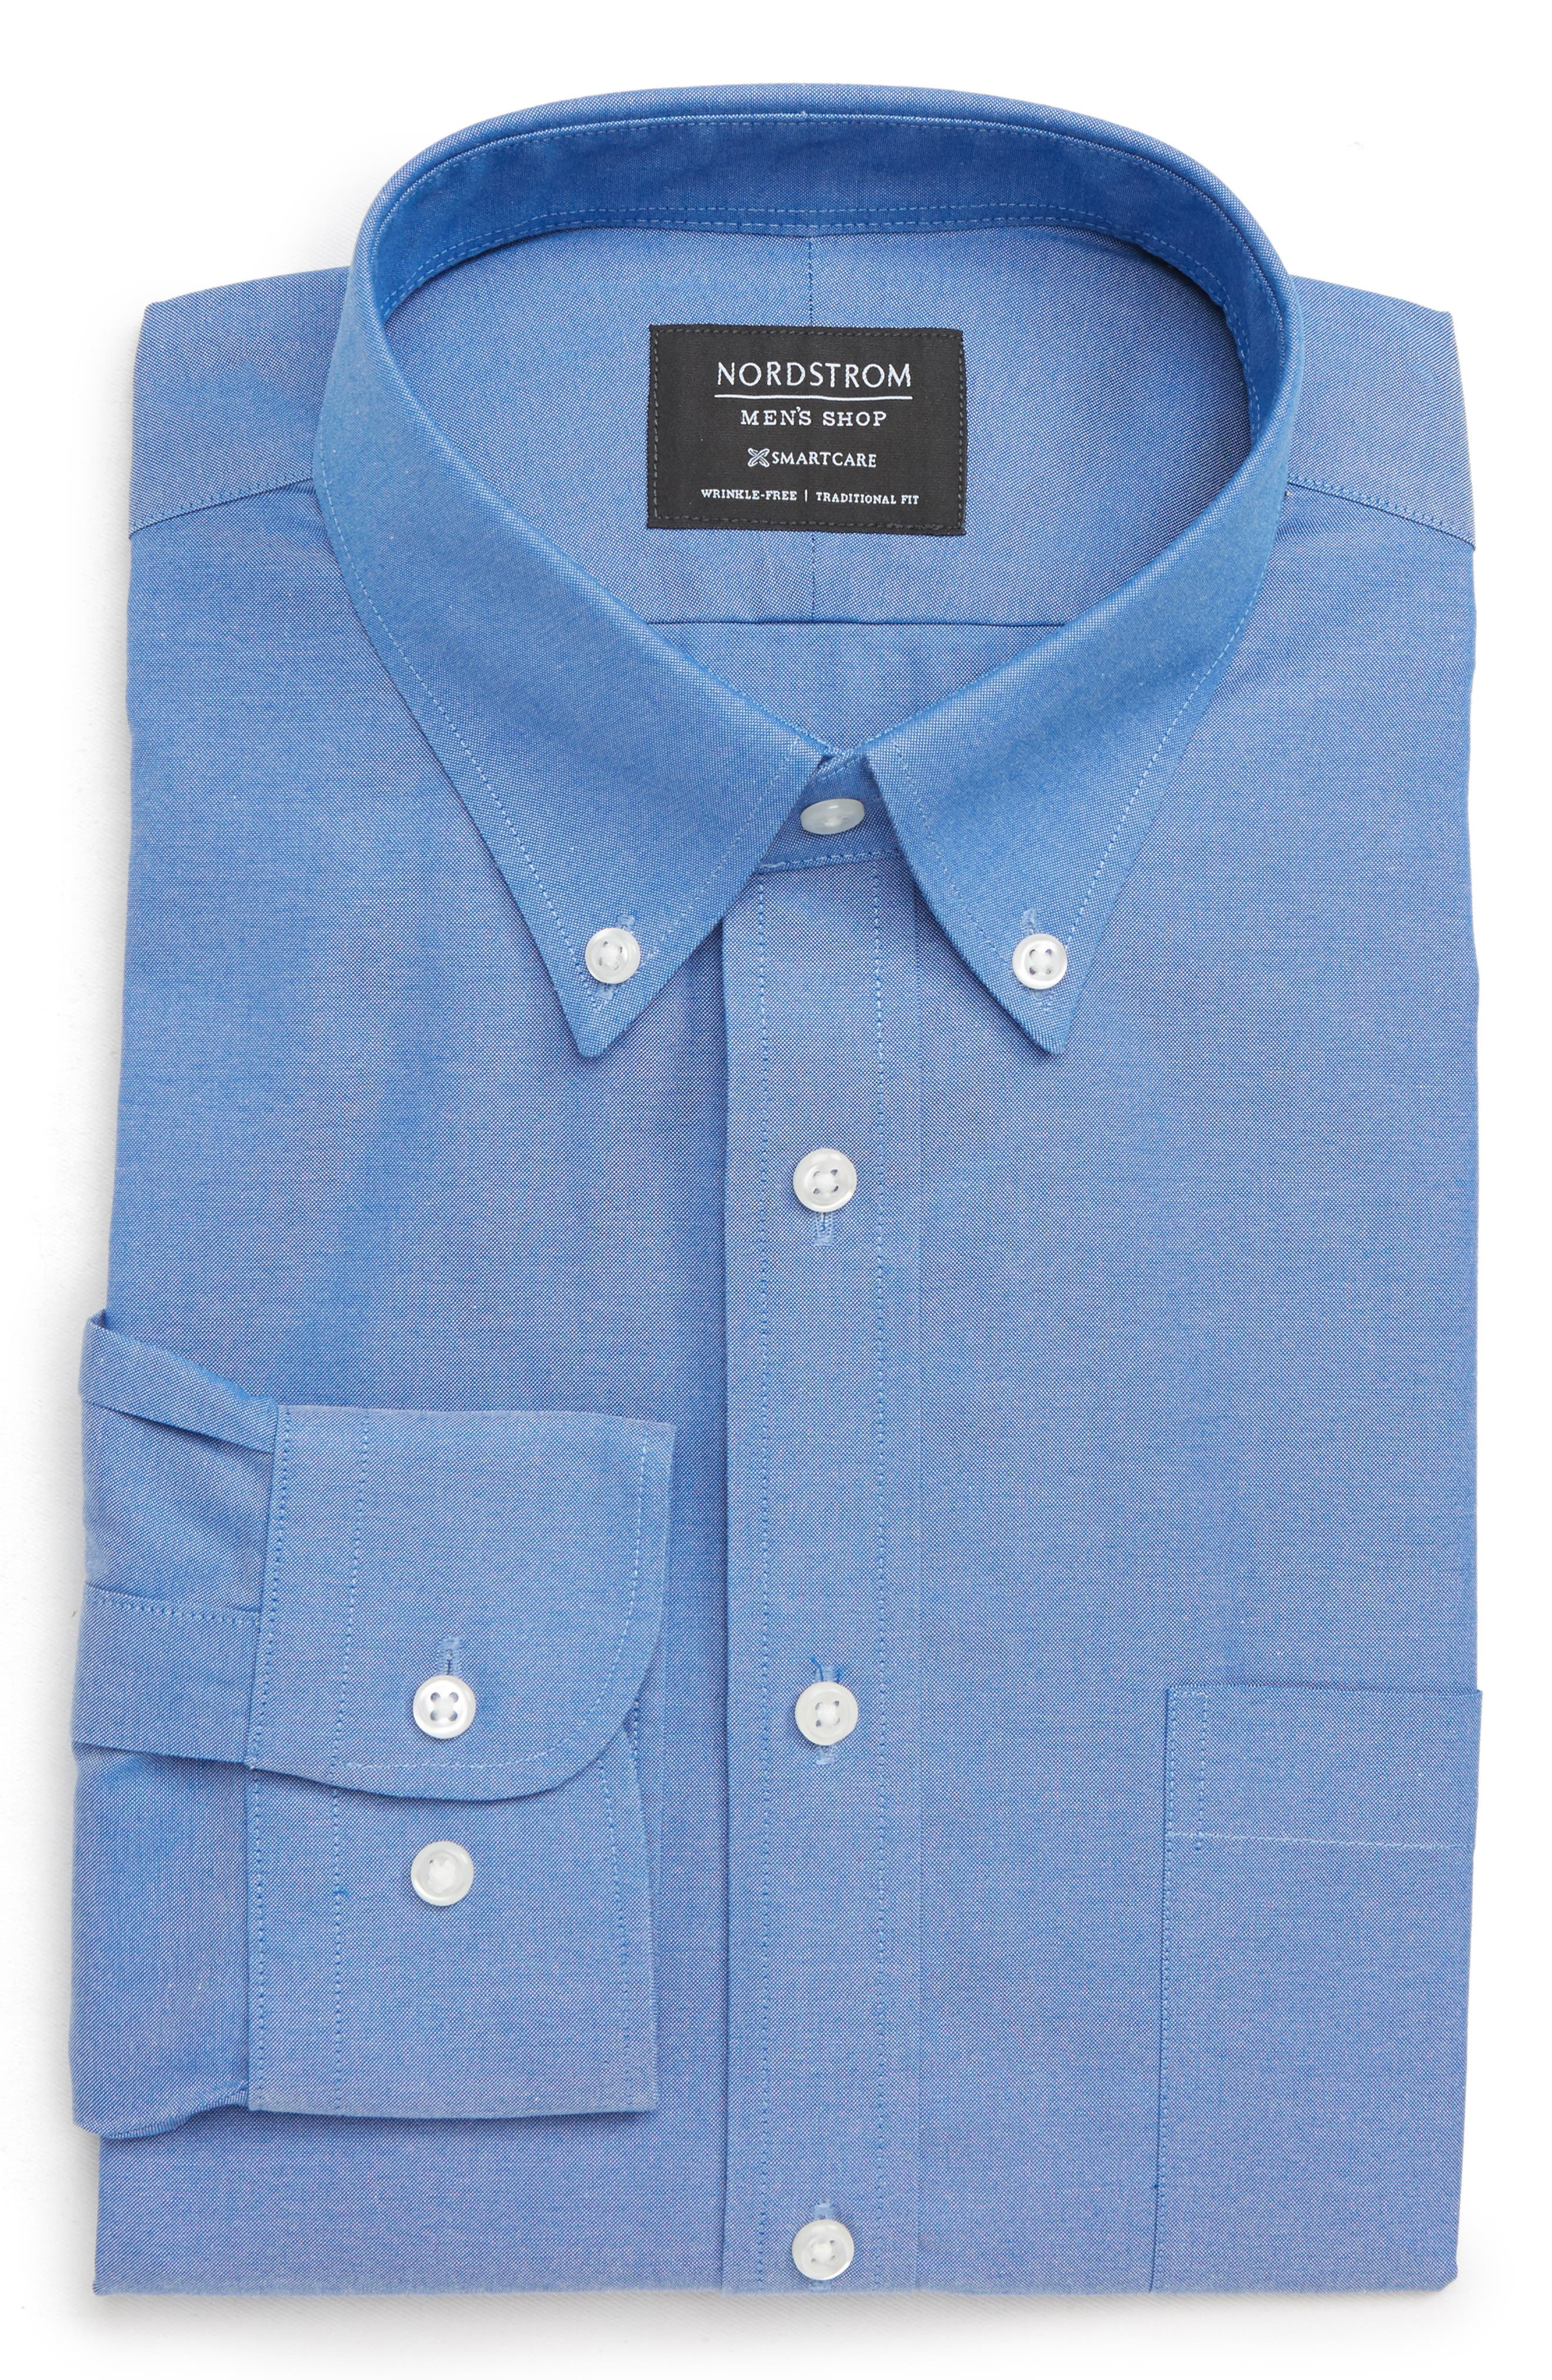 Nordstrom Shop Smartcare(TM) Traditional Fit Pinpoint Dress Shirt 32/33 - Blue